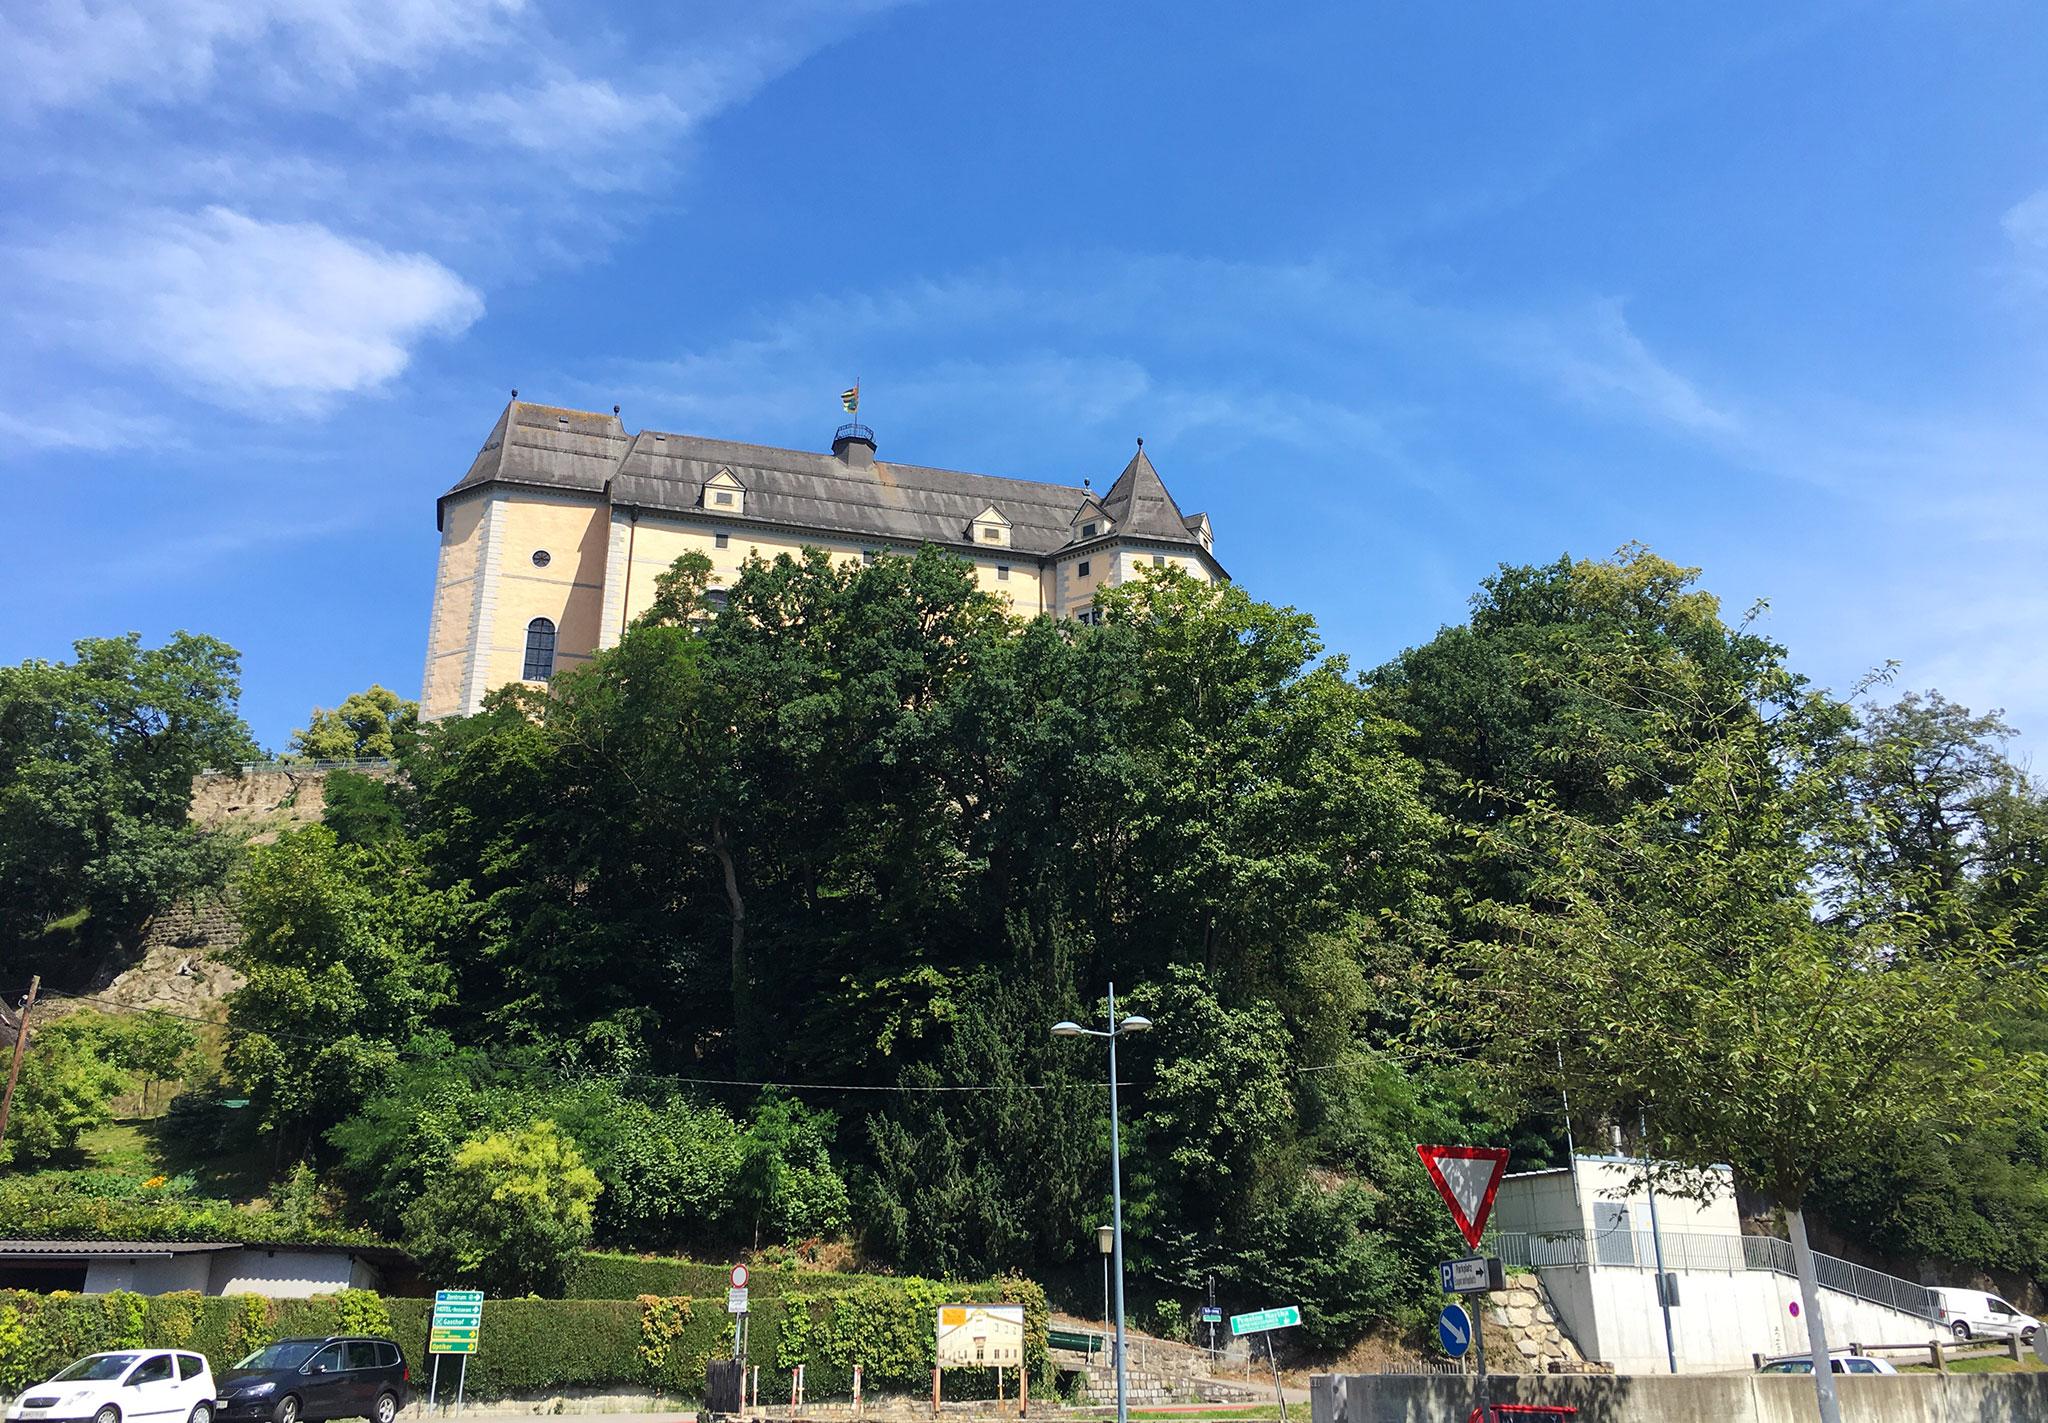 Greinsburg Castle